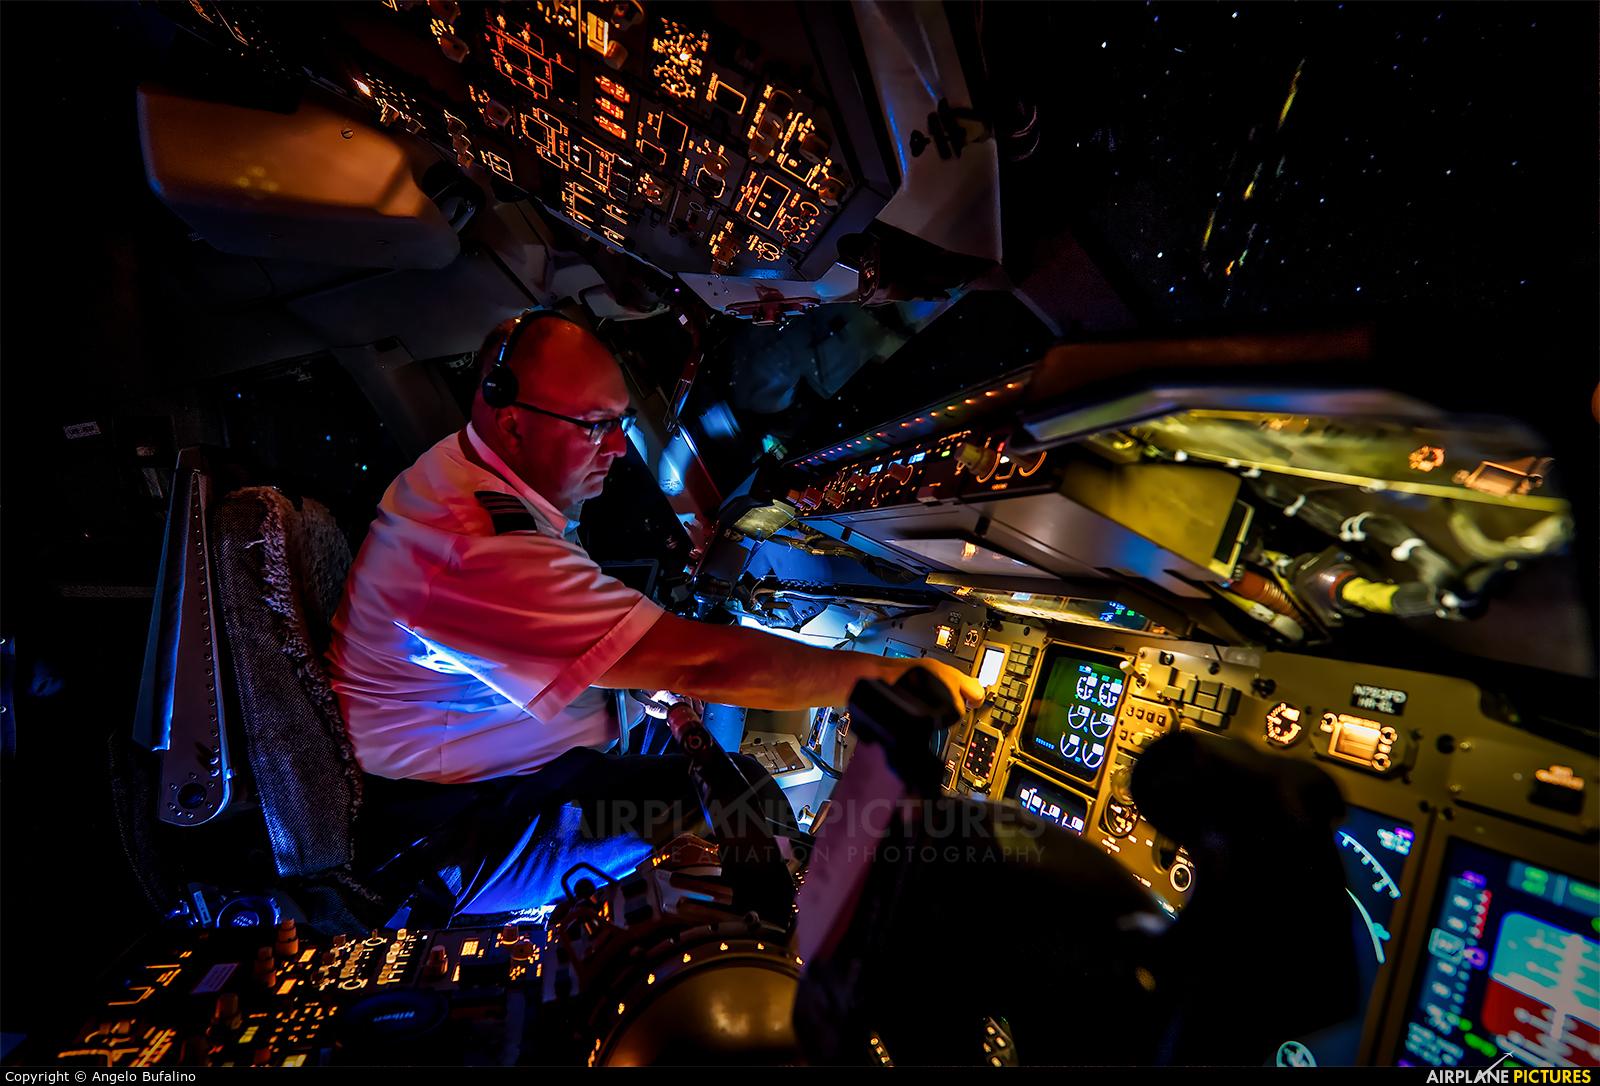 FedEx Federal Express N783FD aircraft at In Flight - Colorado